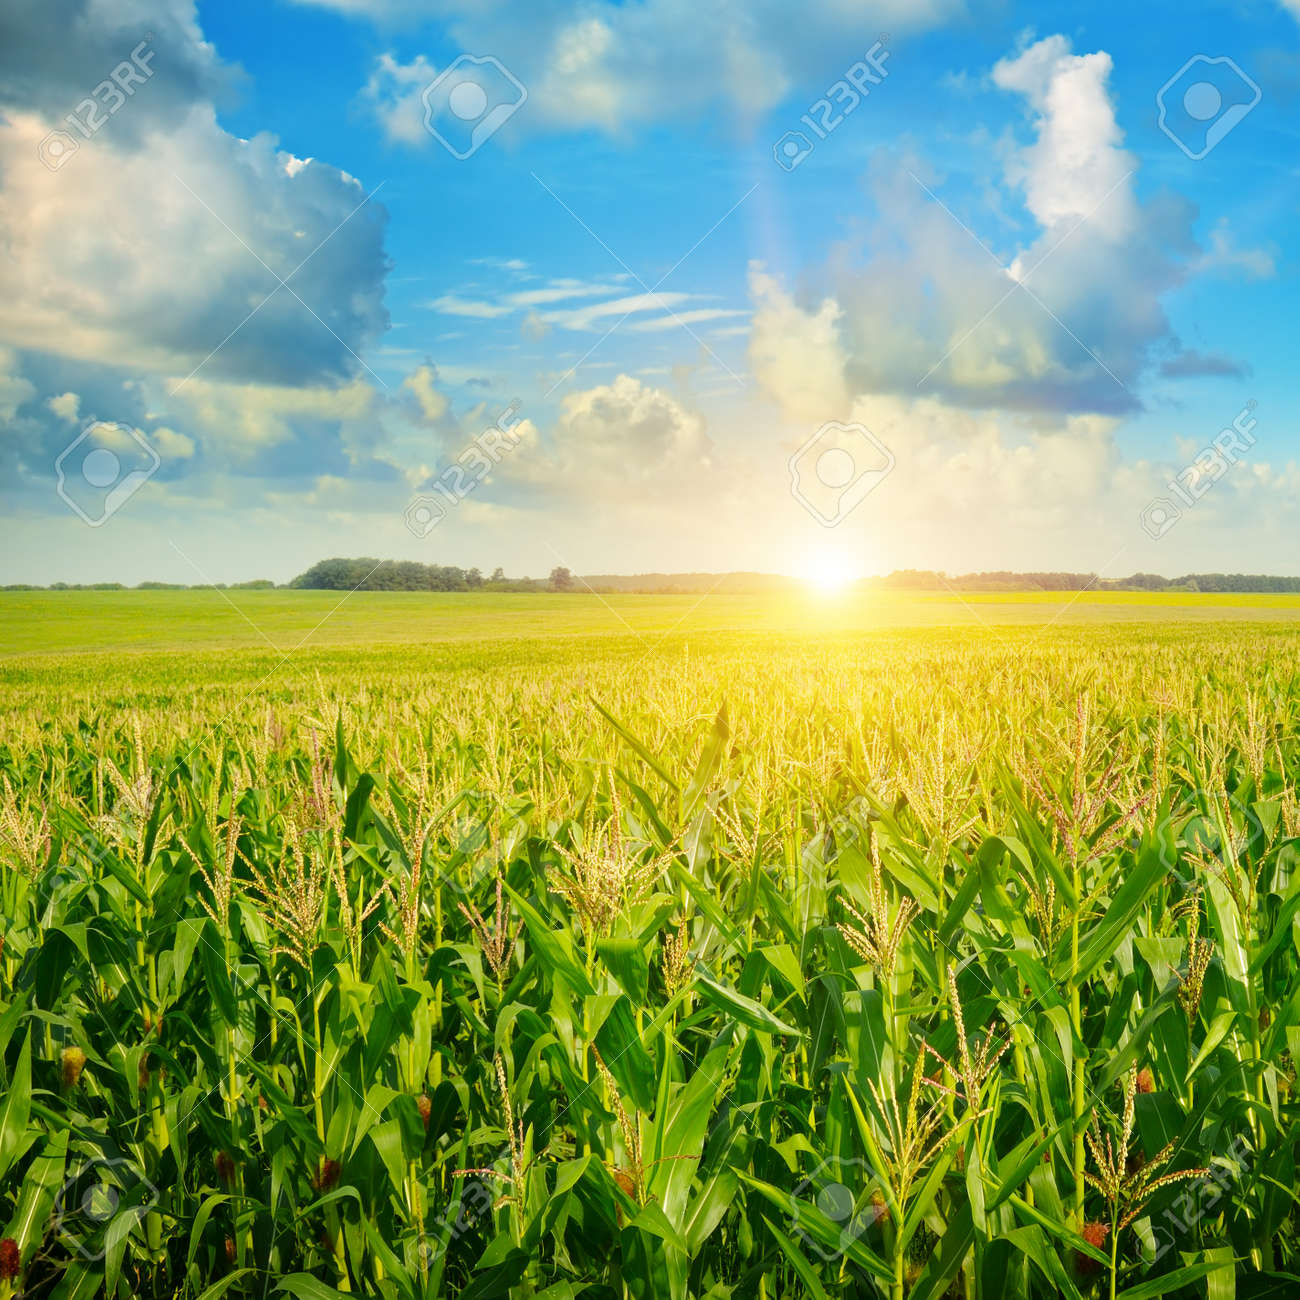 sunrise over the corn field - 51972586